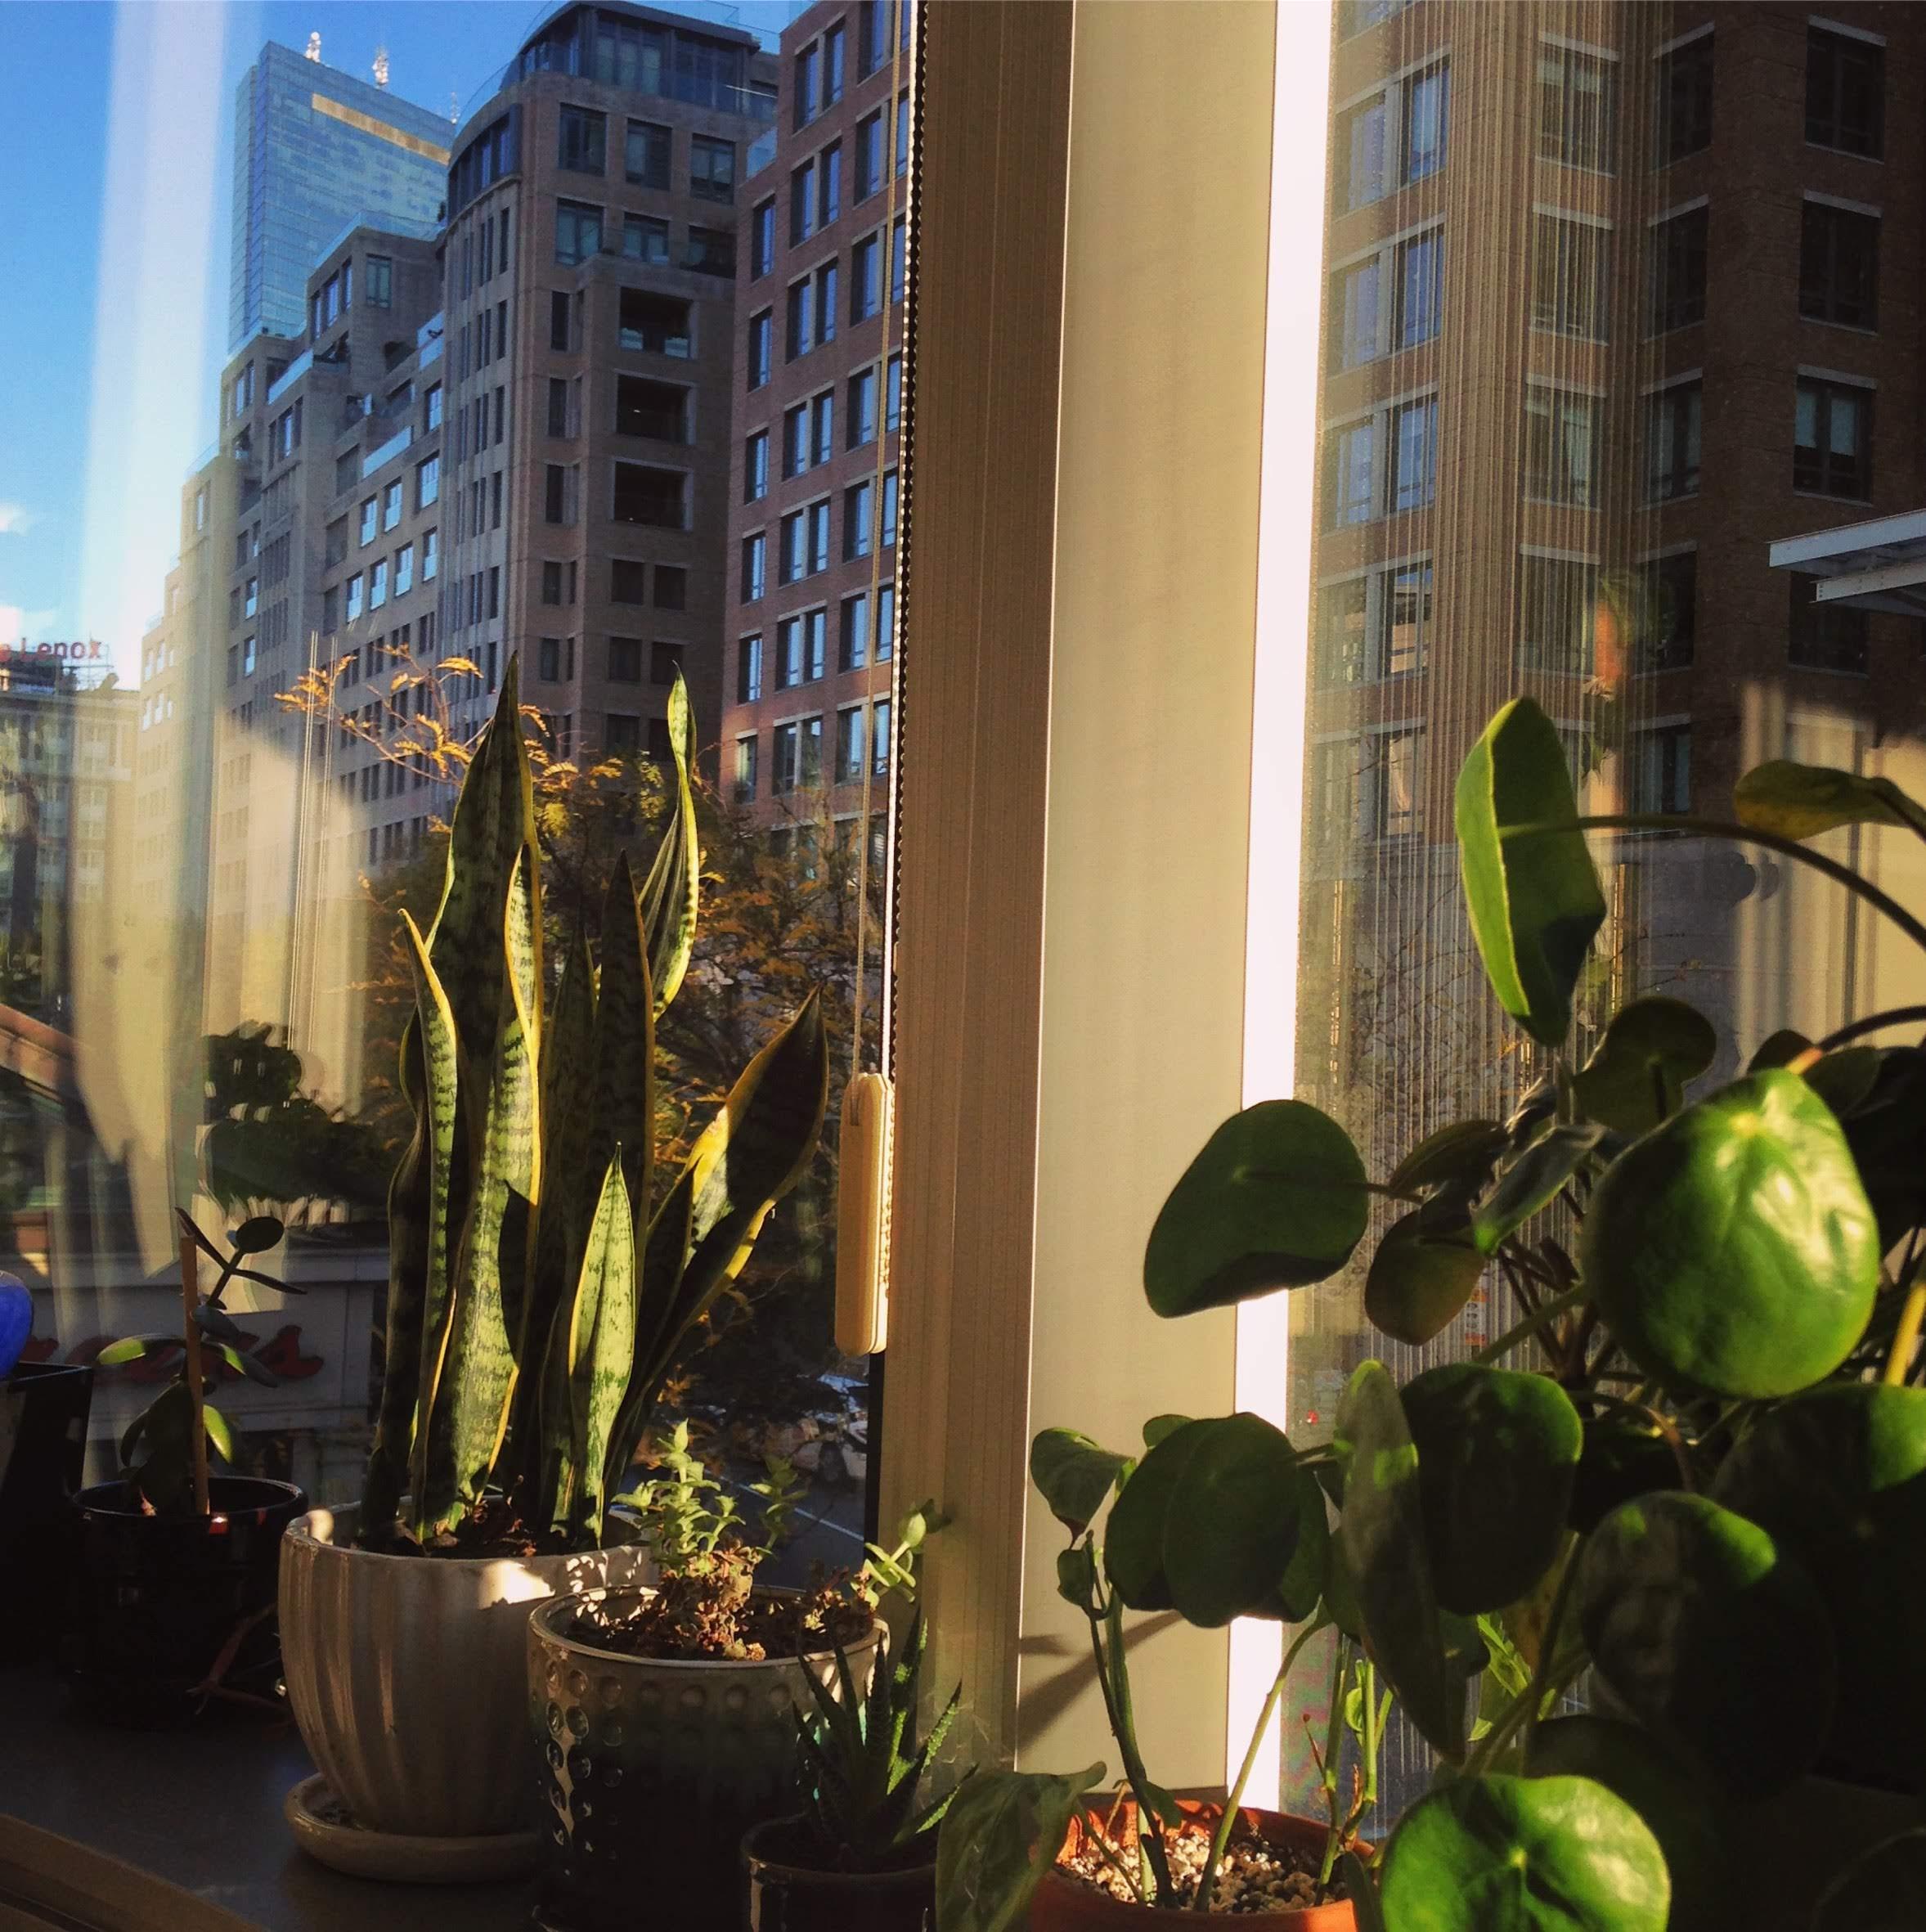 plants sunny window blue sky